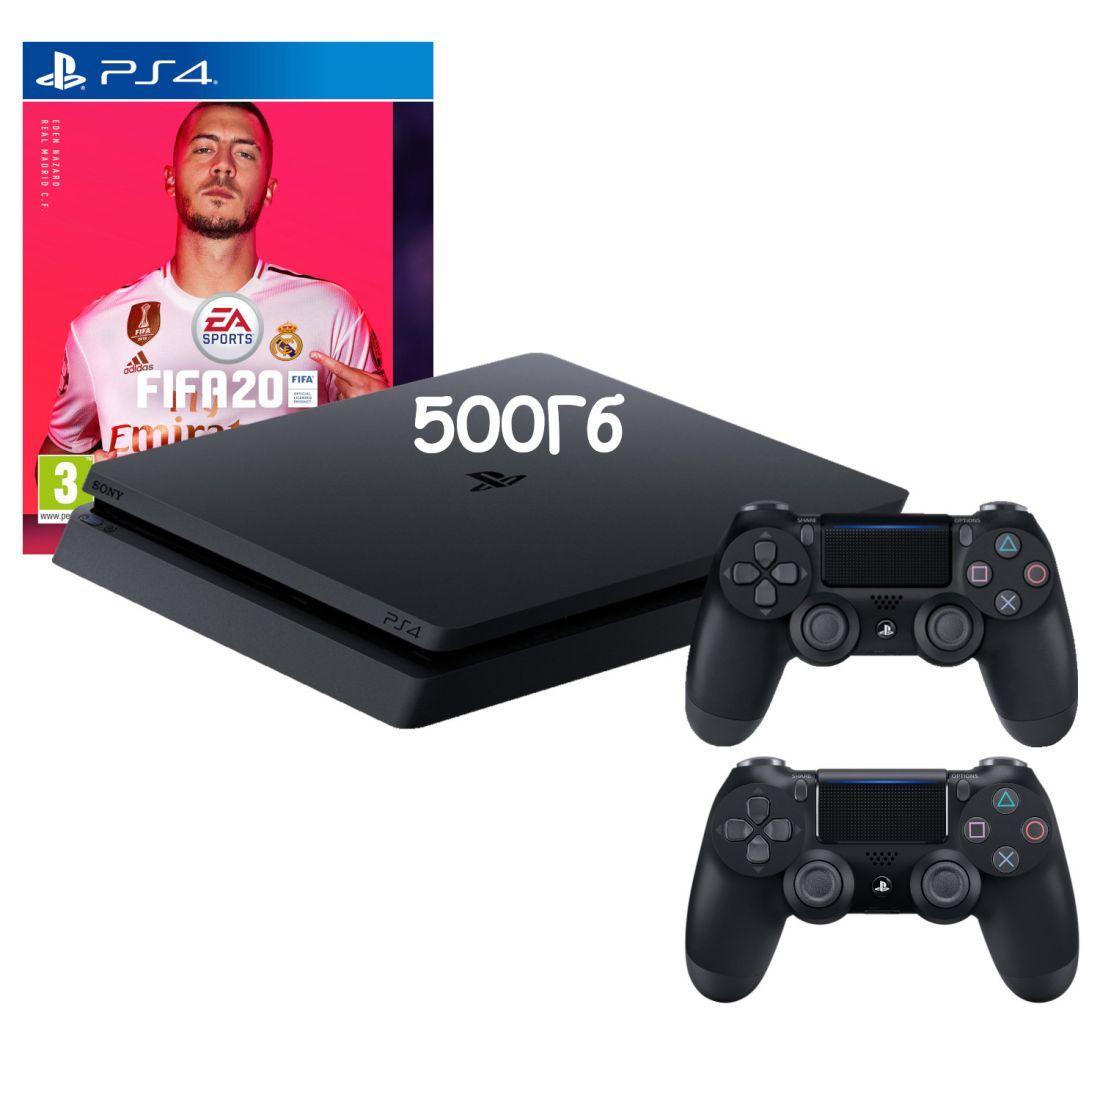 Sony PlayStation 4 Slim 500 ГБ + Доп. джойстик + Игра FIFA 20